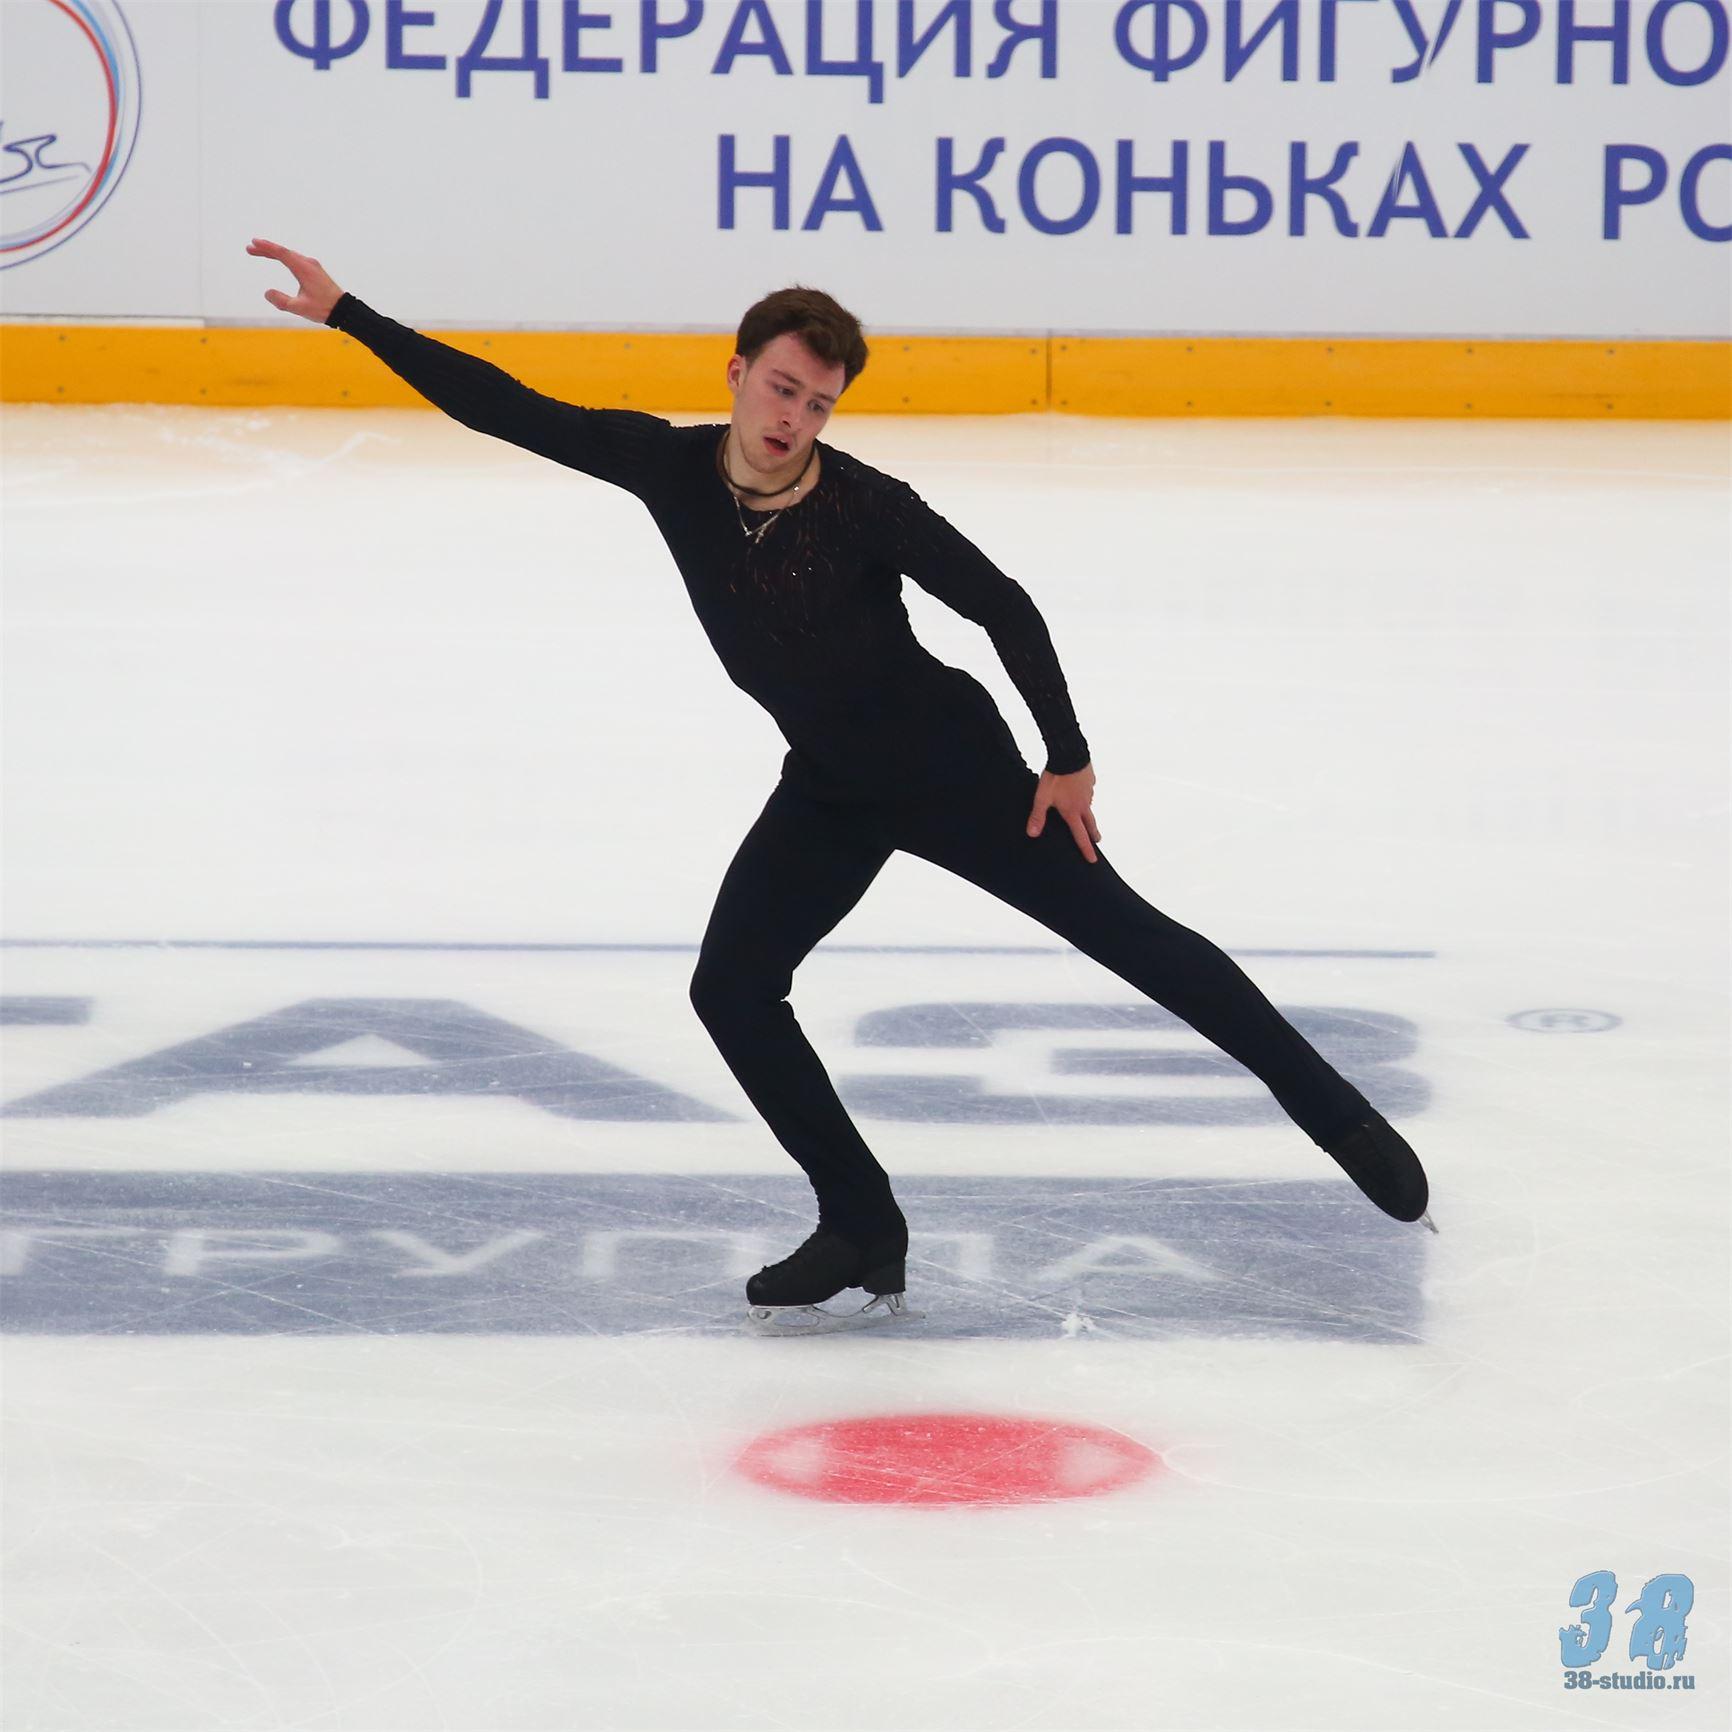 Дмитрий Алиев - Страница 15 K4G8-NFJuBE